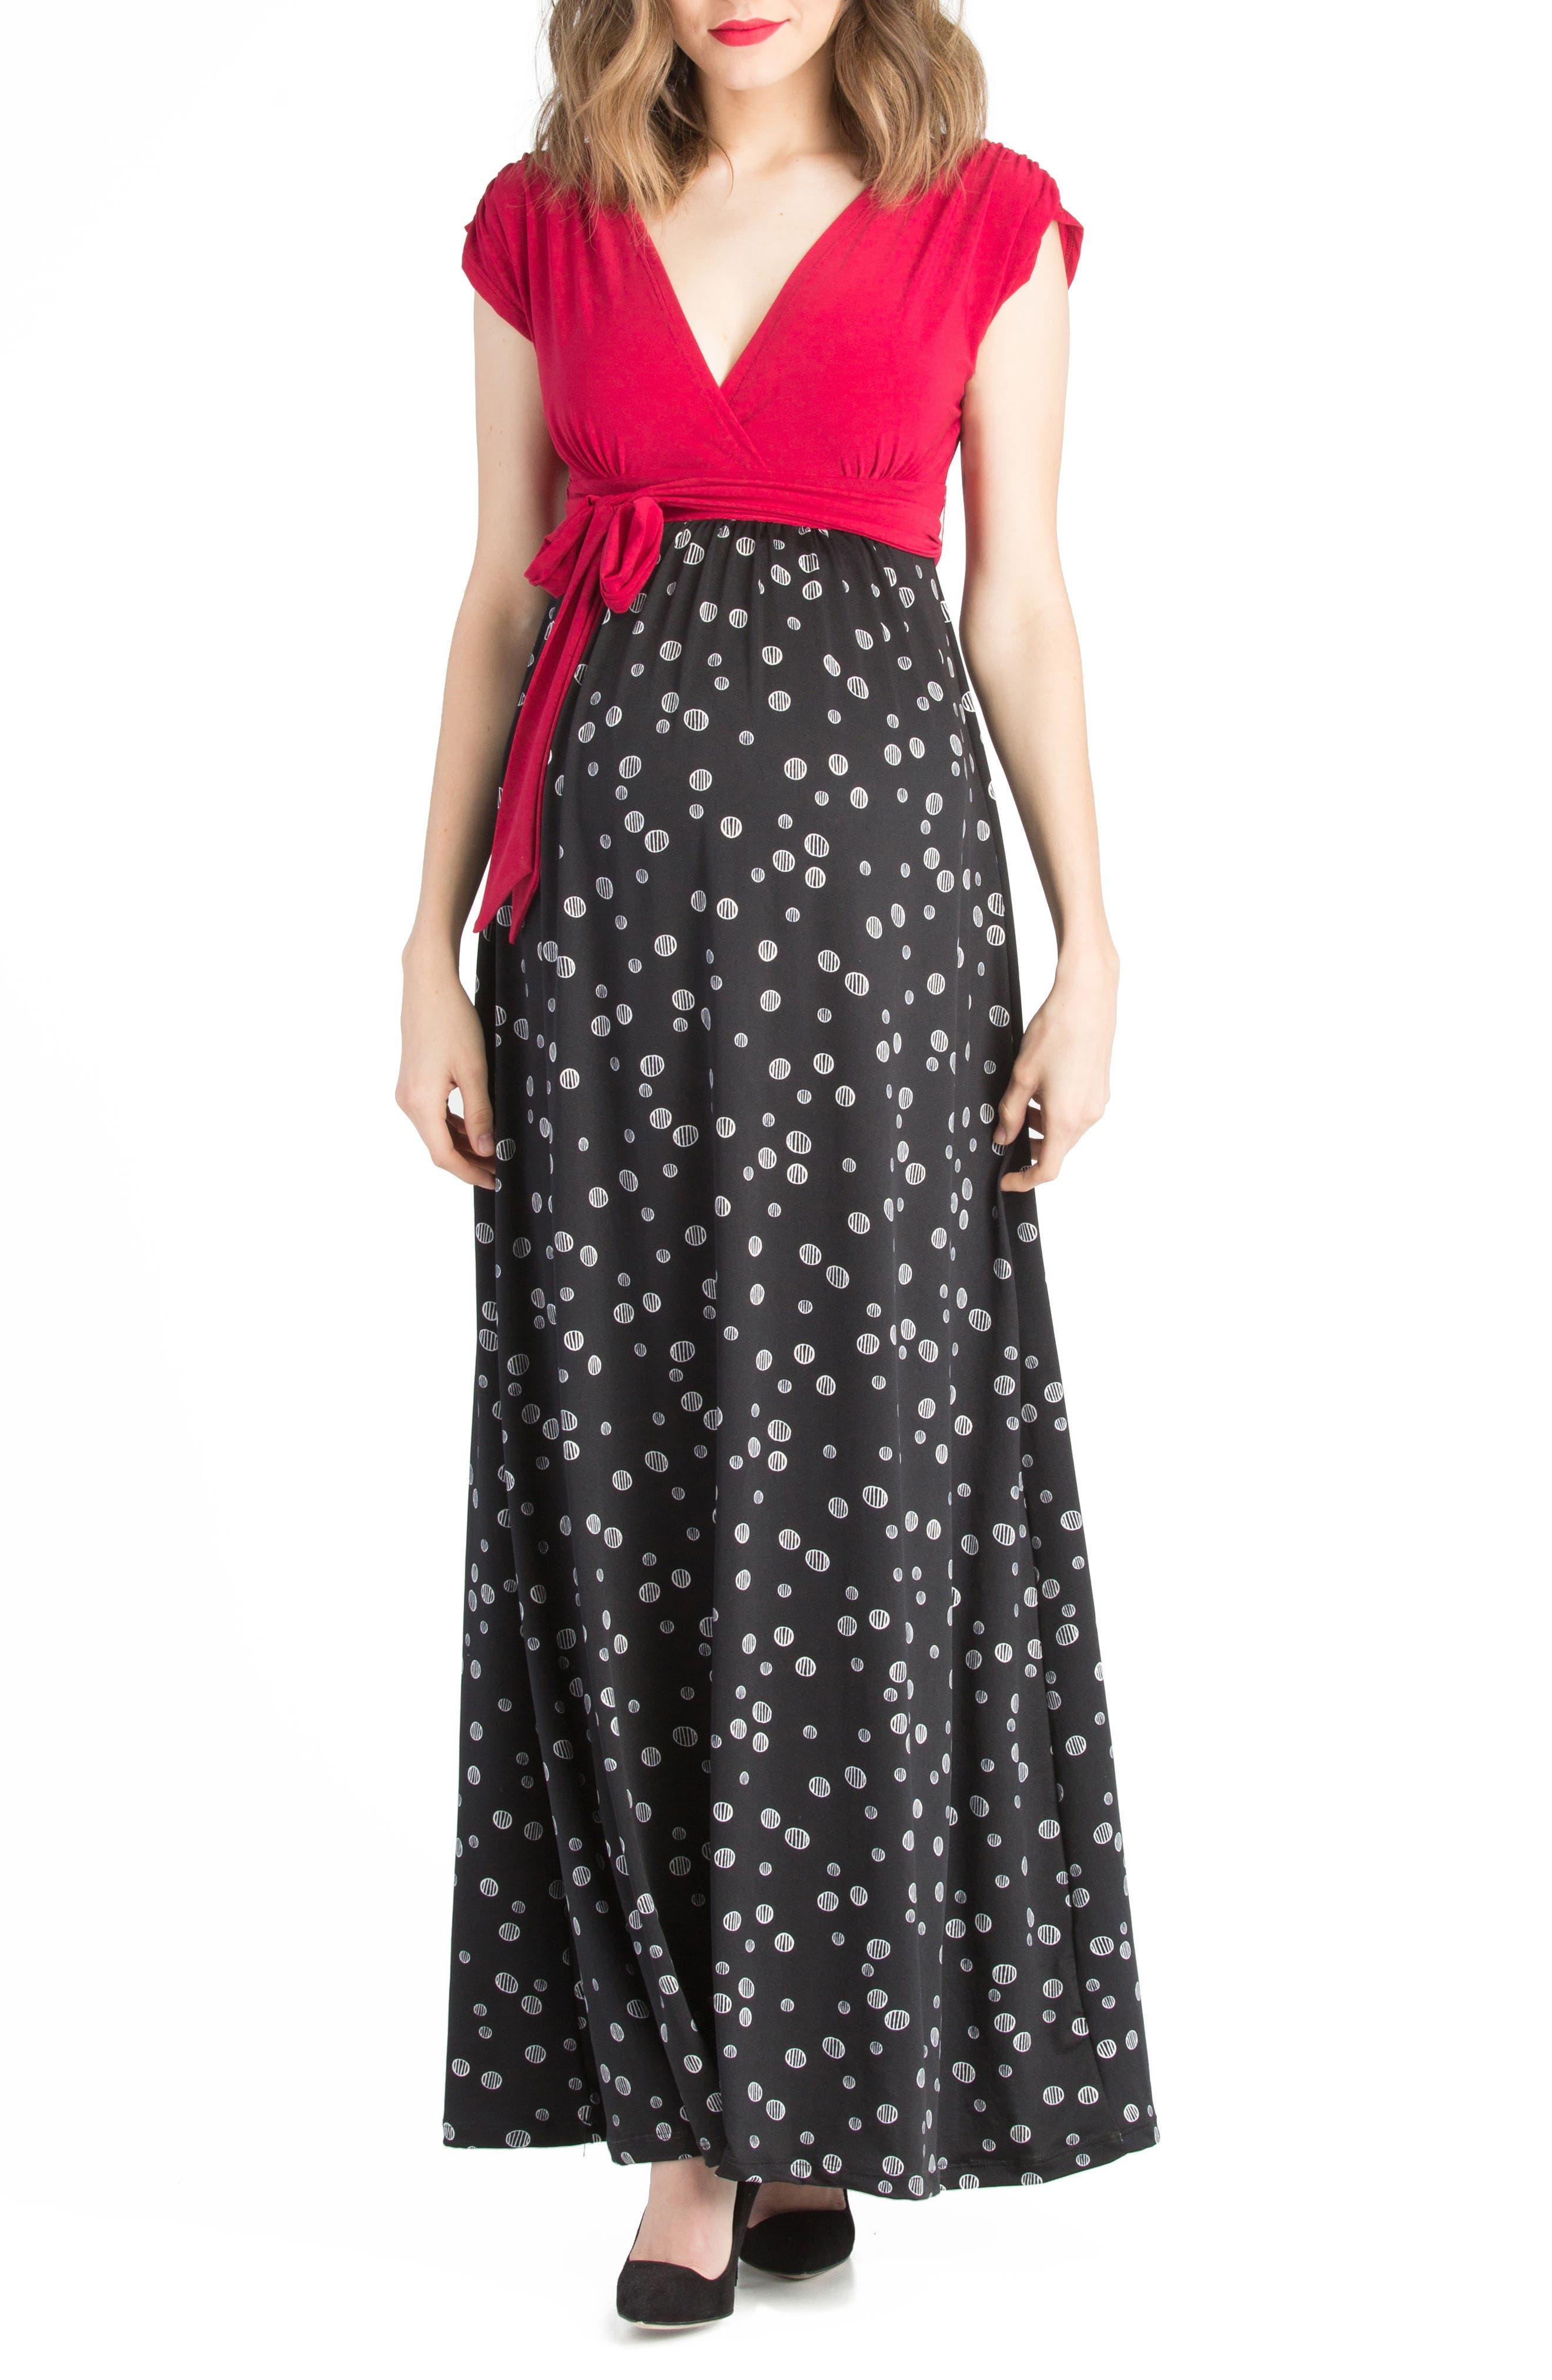 Lilac Clothing Colorblock Nursing Maxi Dress